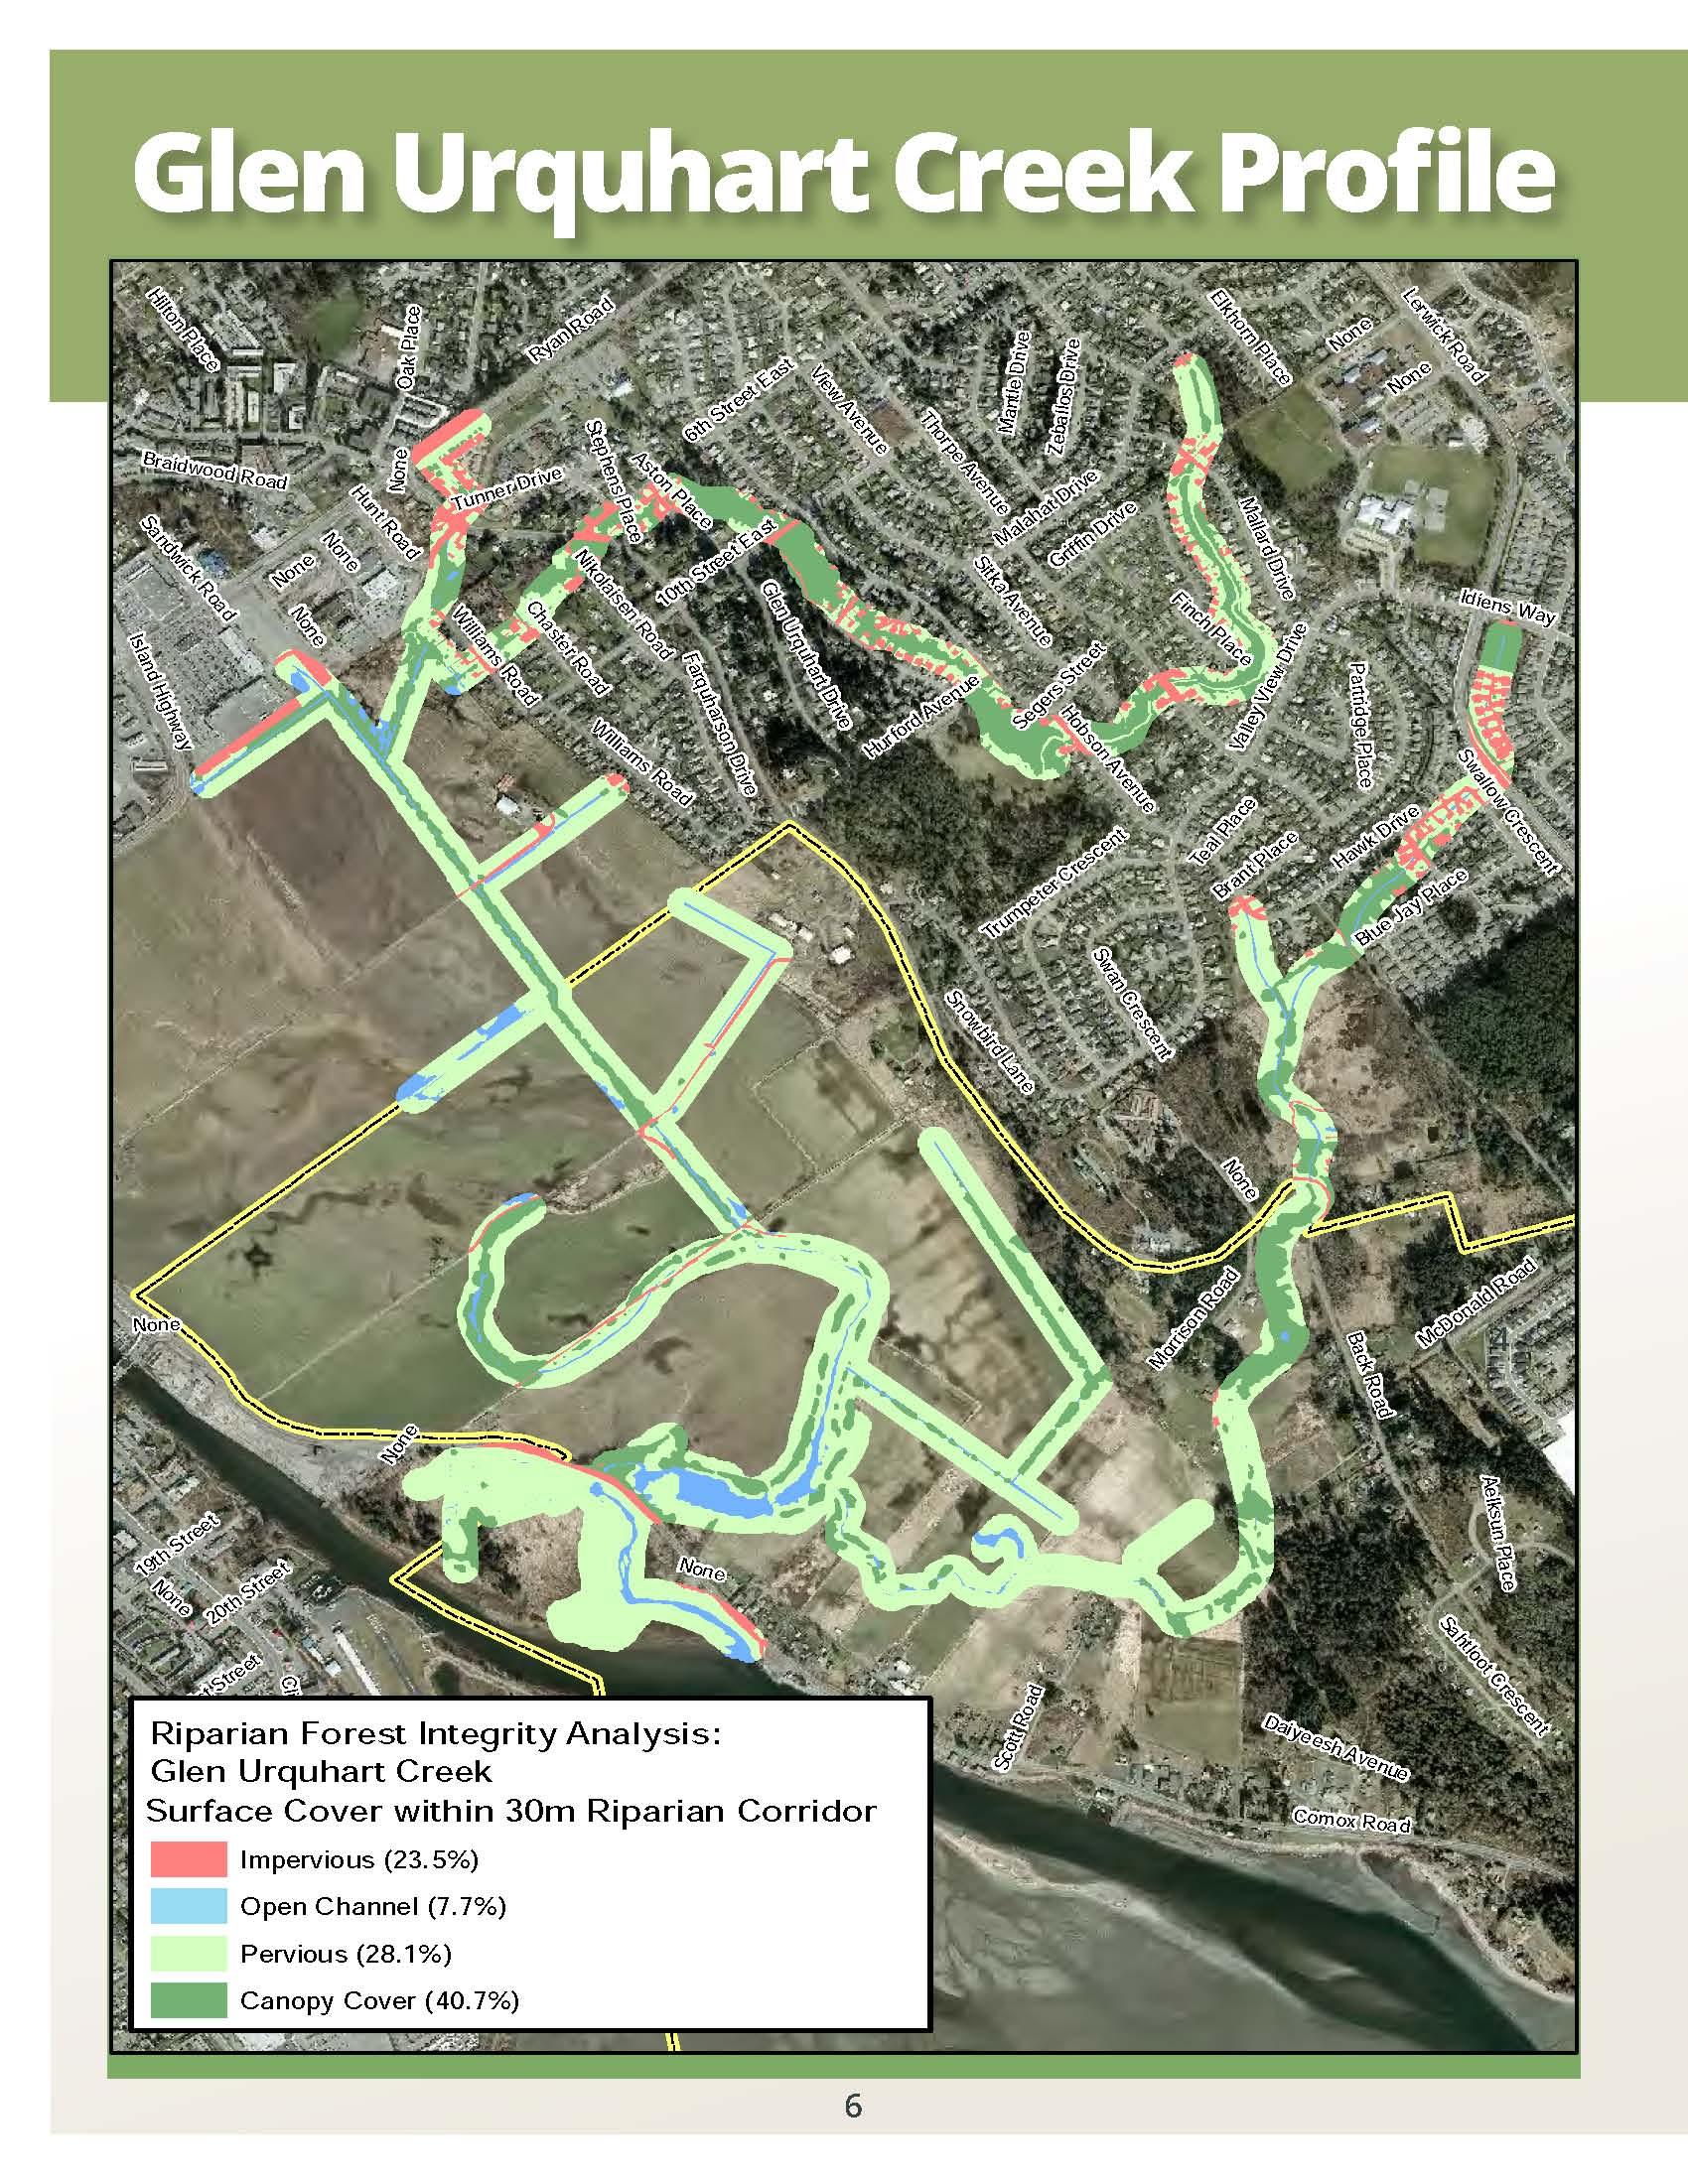 Courtenay_Glen Urquhart Creek_aerial plan